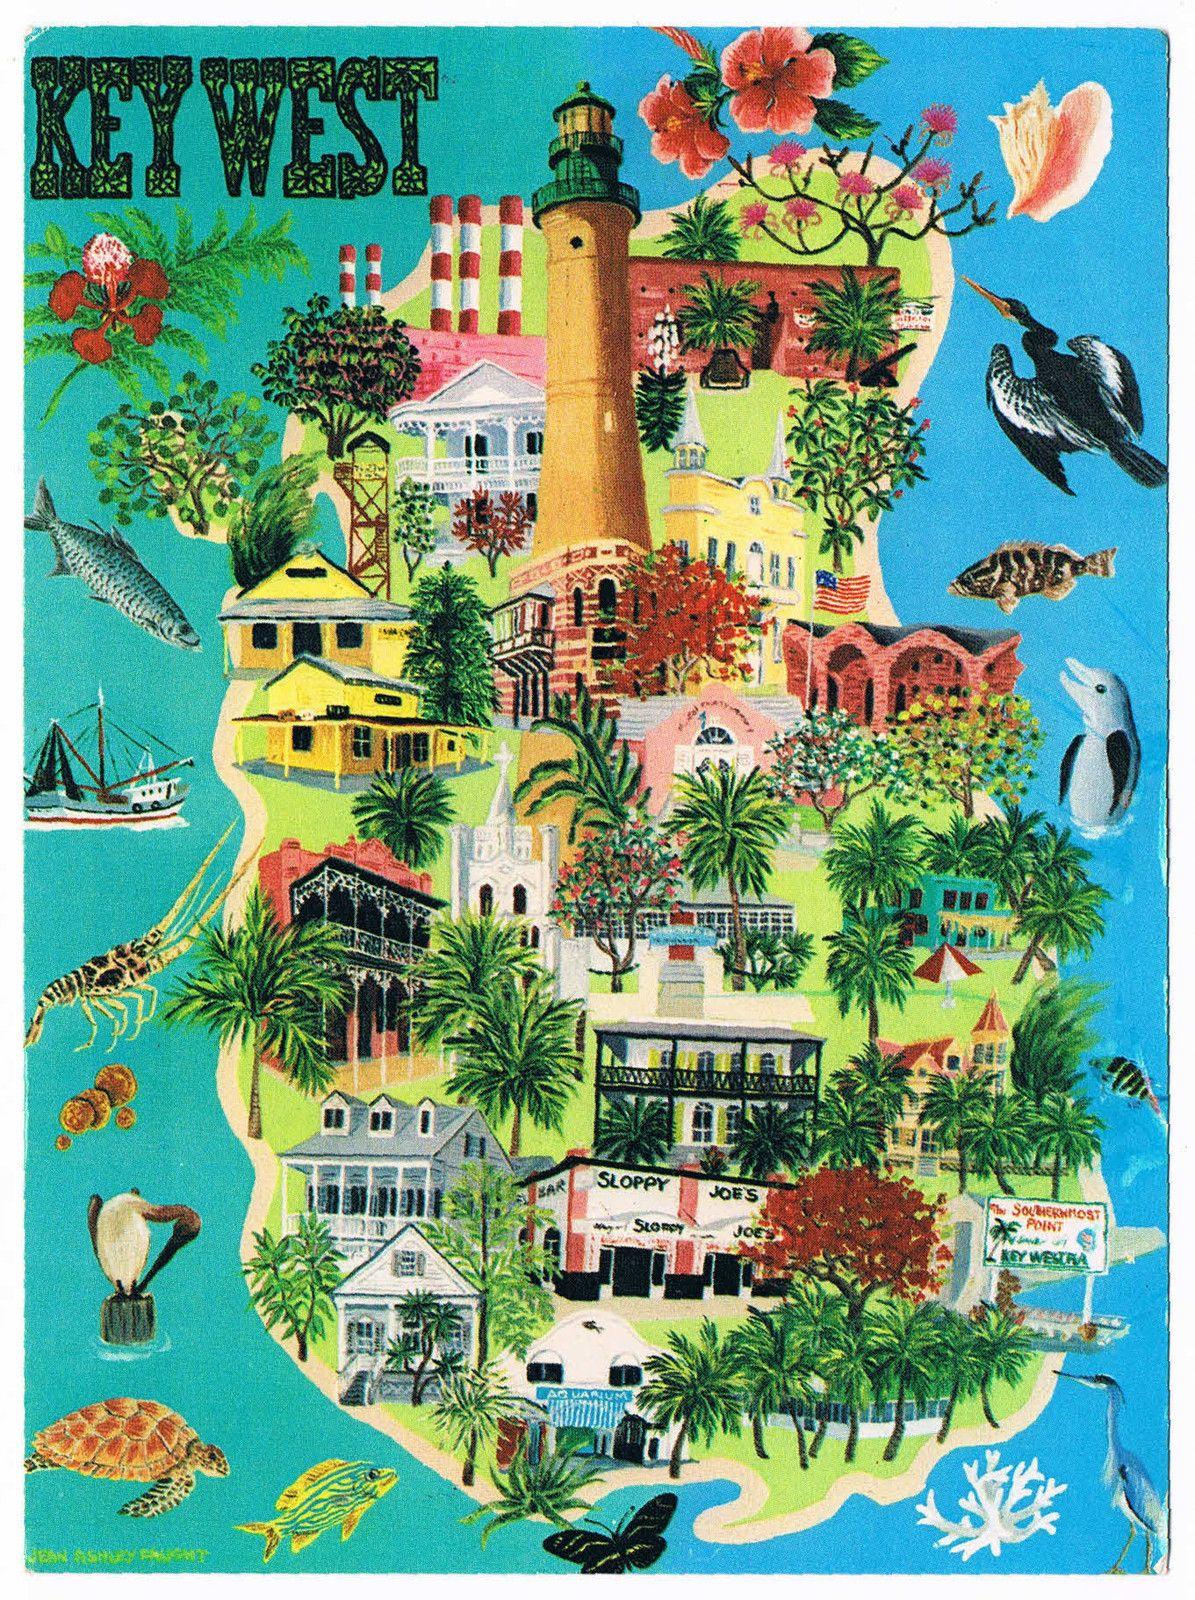 Key West The Southernmost City Postcard kEy WeSt